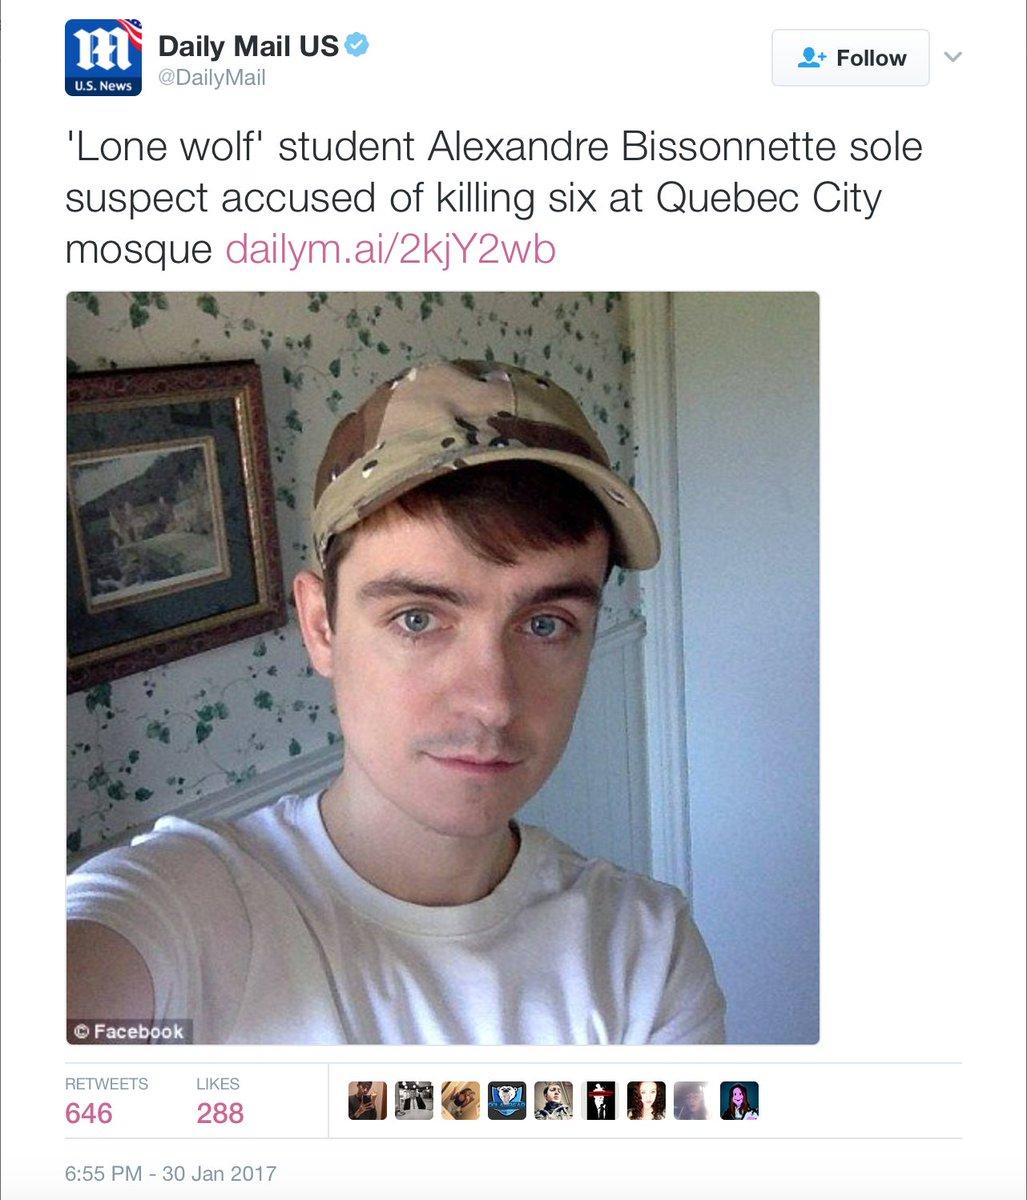 RT @jk_rowling: He. Is. A. Terrorist. Not. A. Lone. Wolf. https://t.co/OO3qDGhzwr